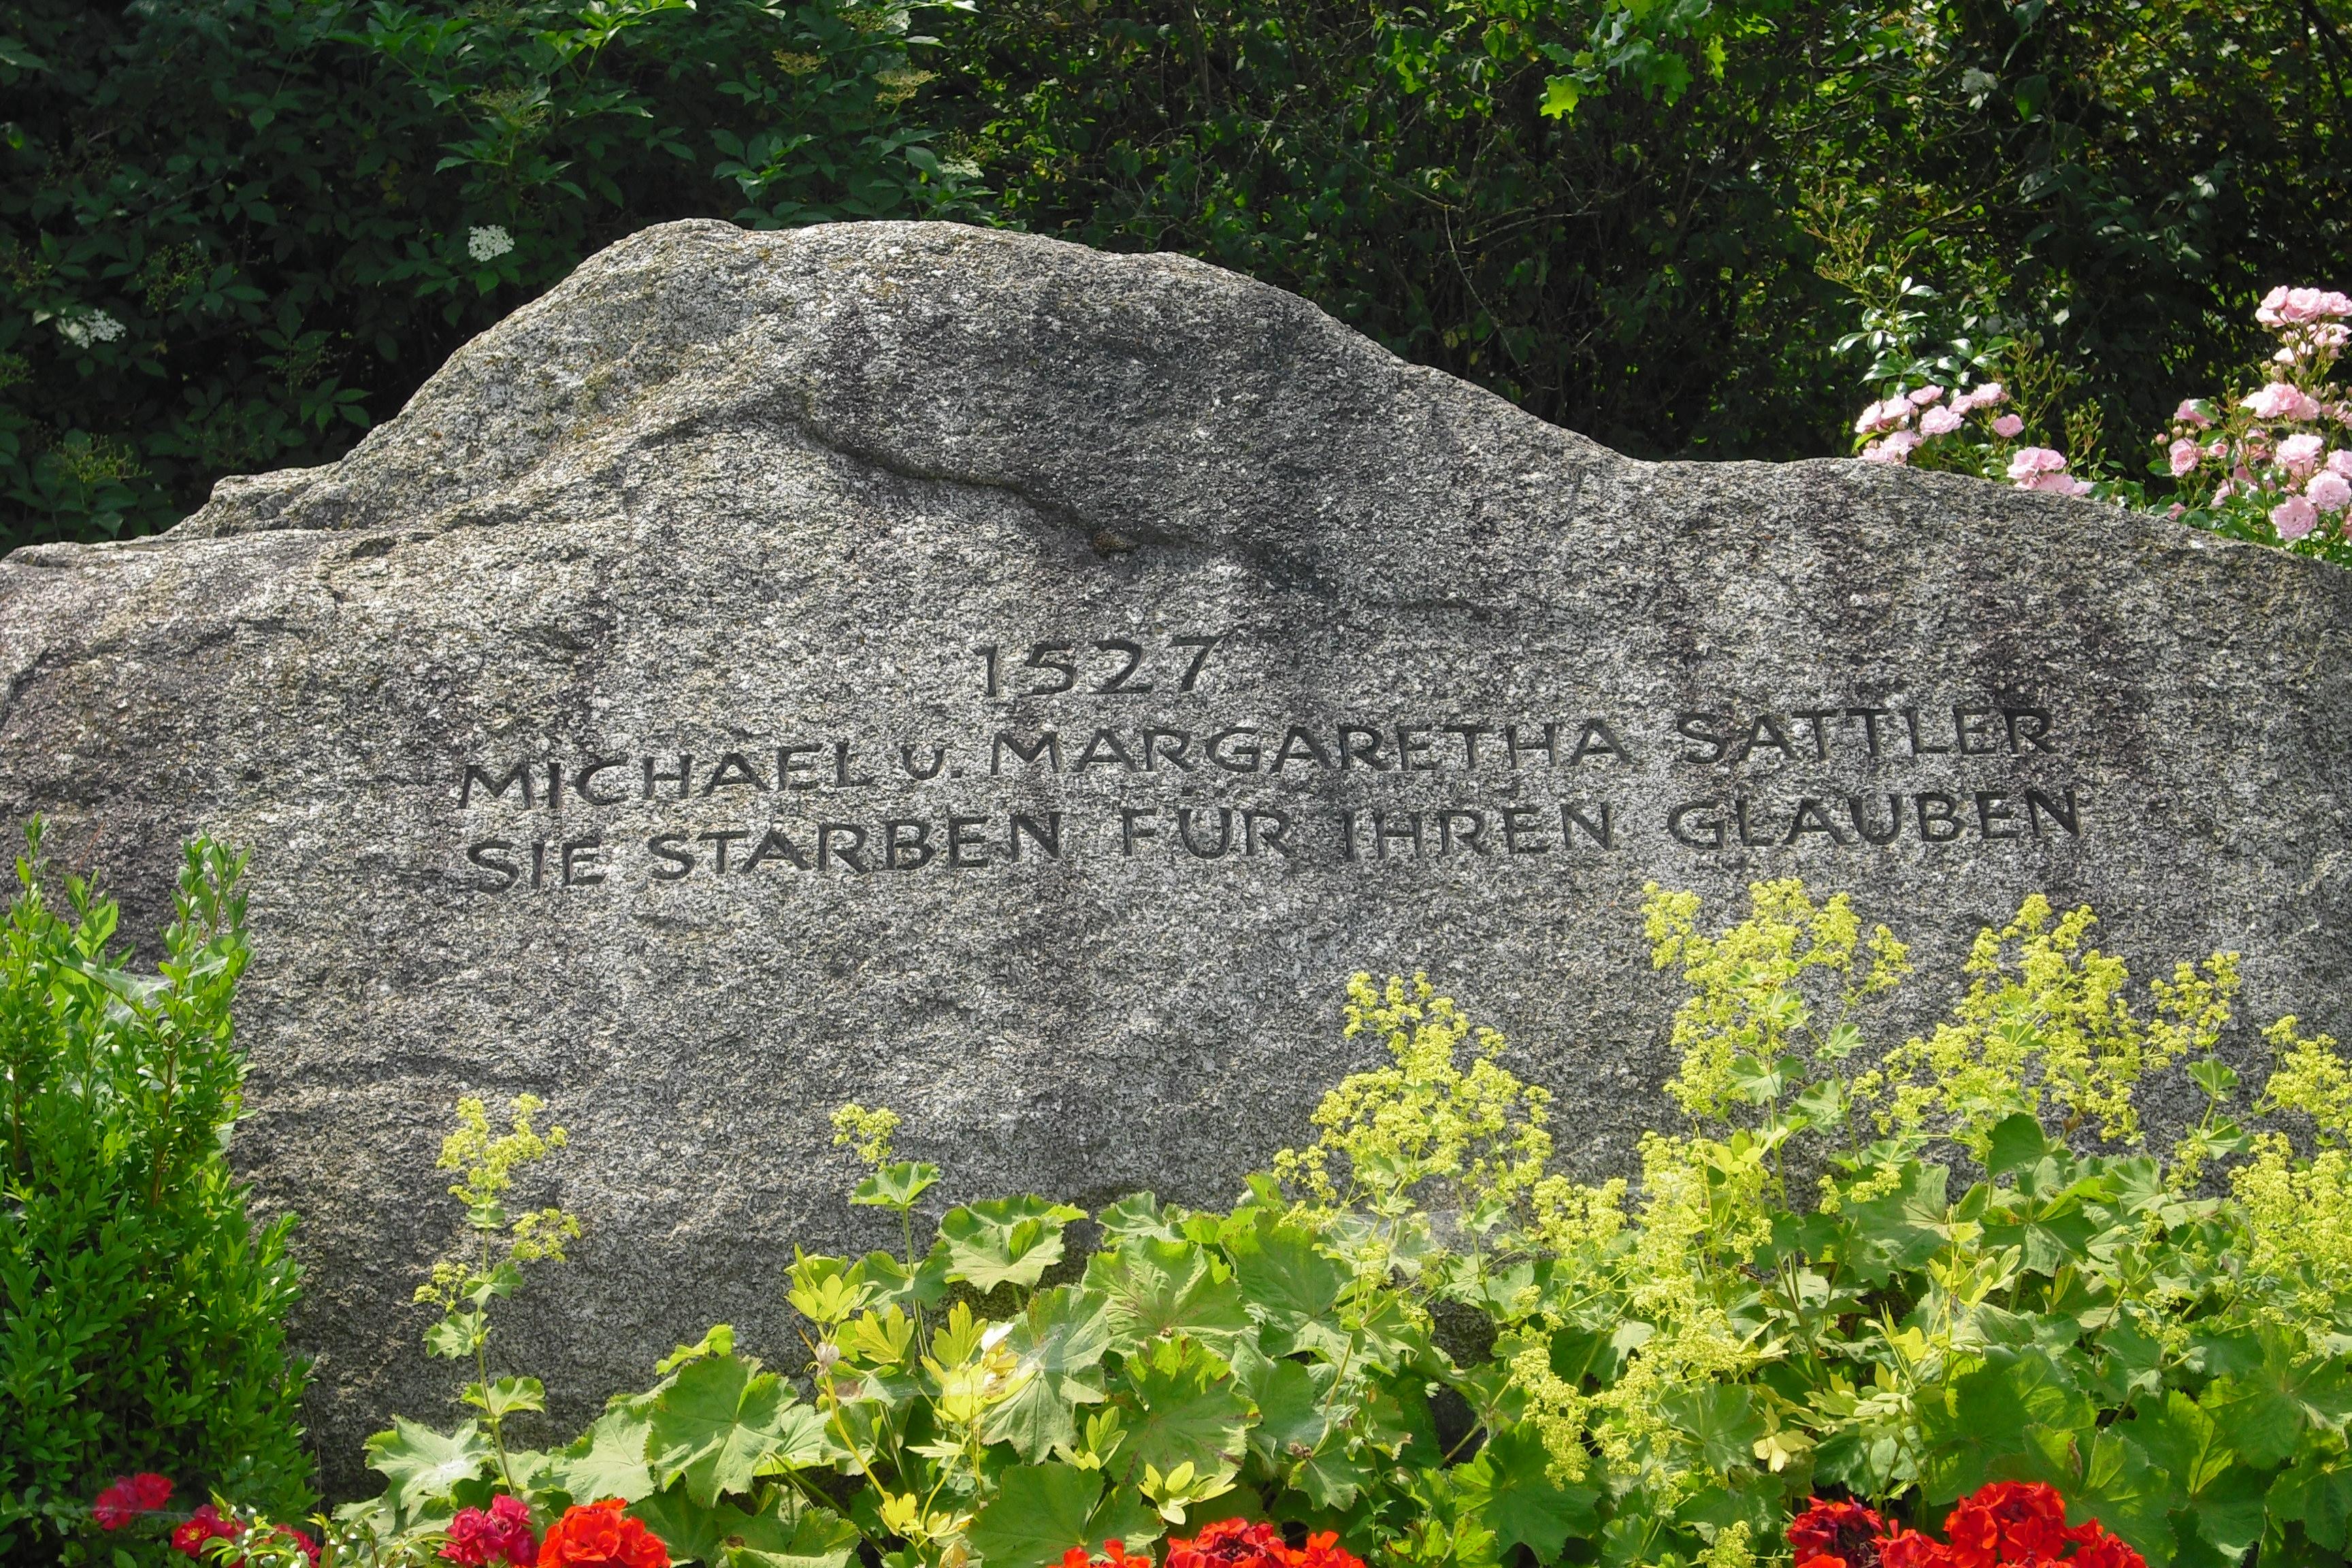 MichaelSattlerGedenkstein (Gregor Helms)